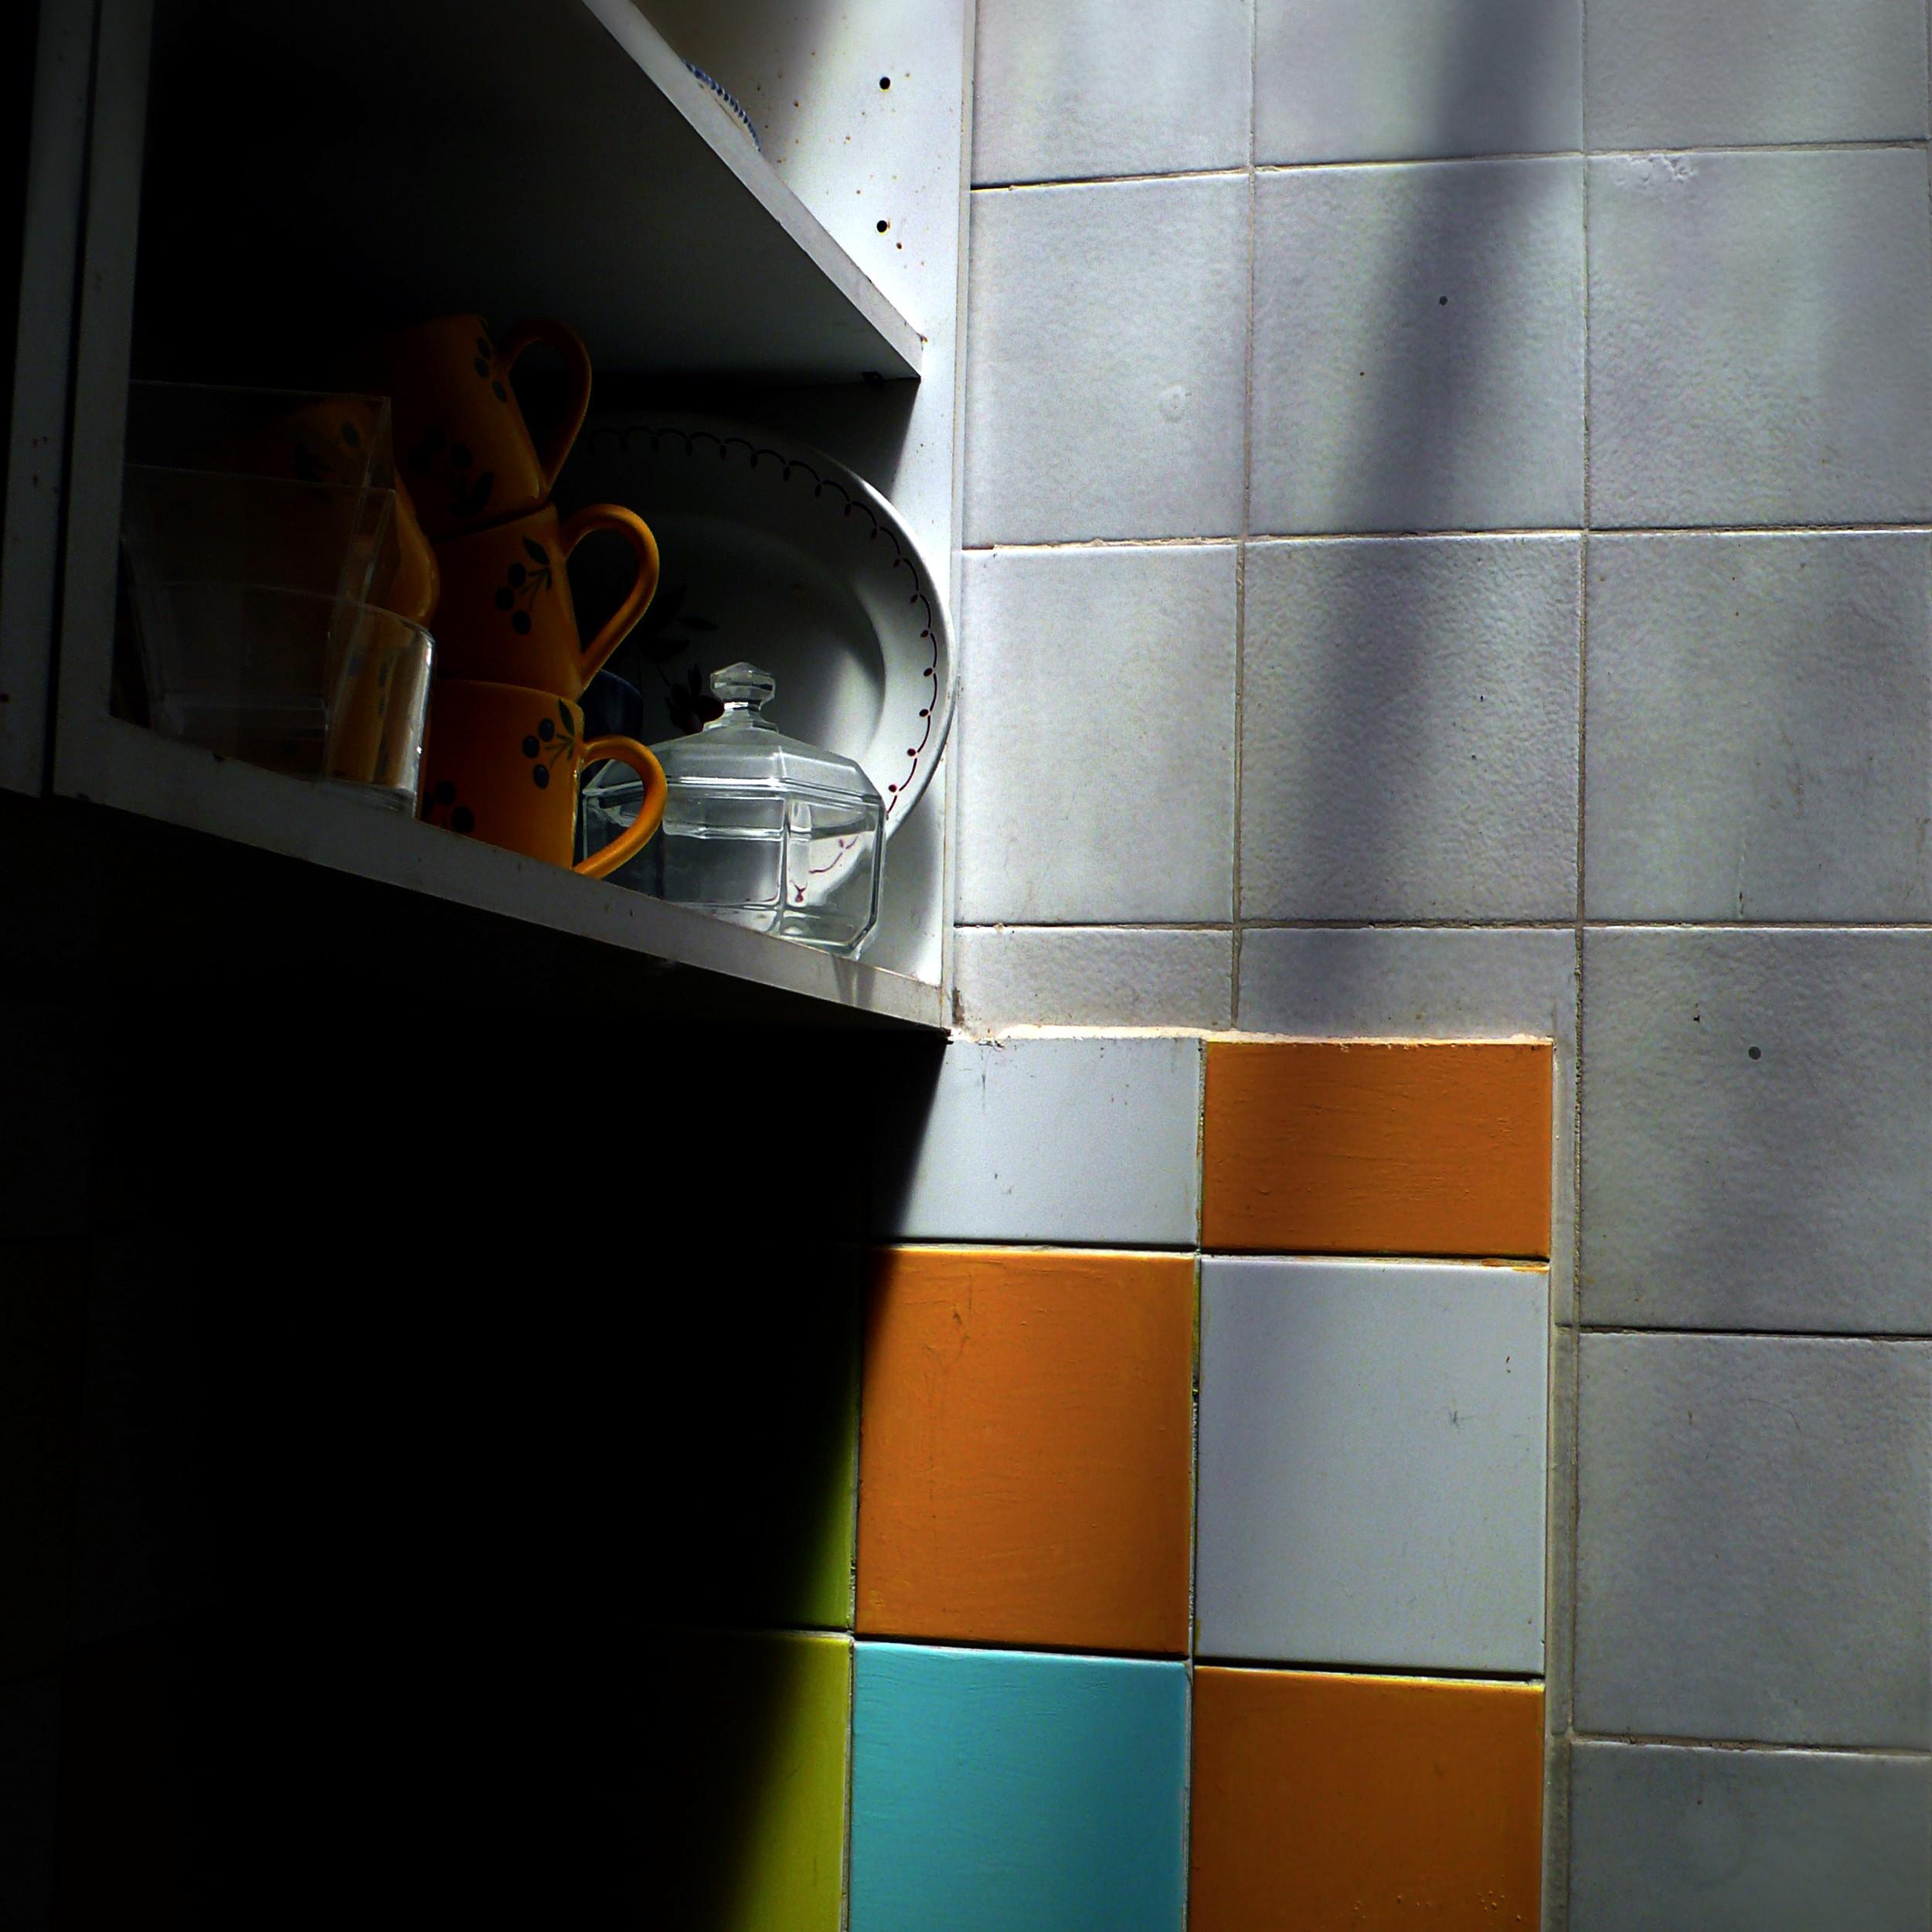 Gerhard S Kitchen Bath Store Wayzata Boulevard Minnetonka Mn